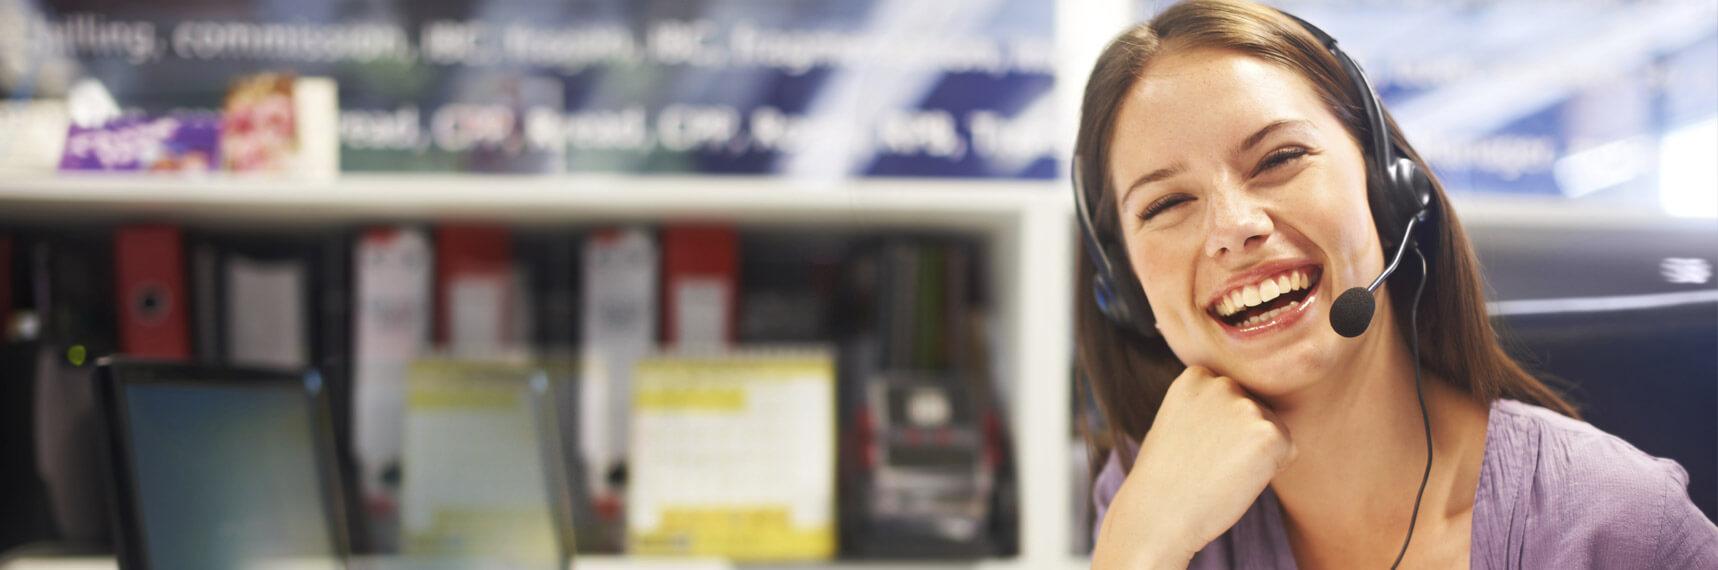 customer care careers